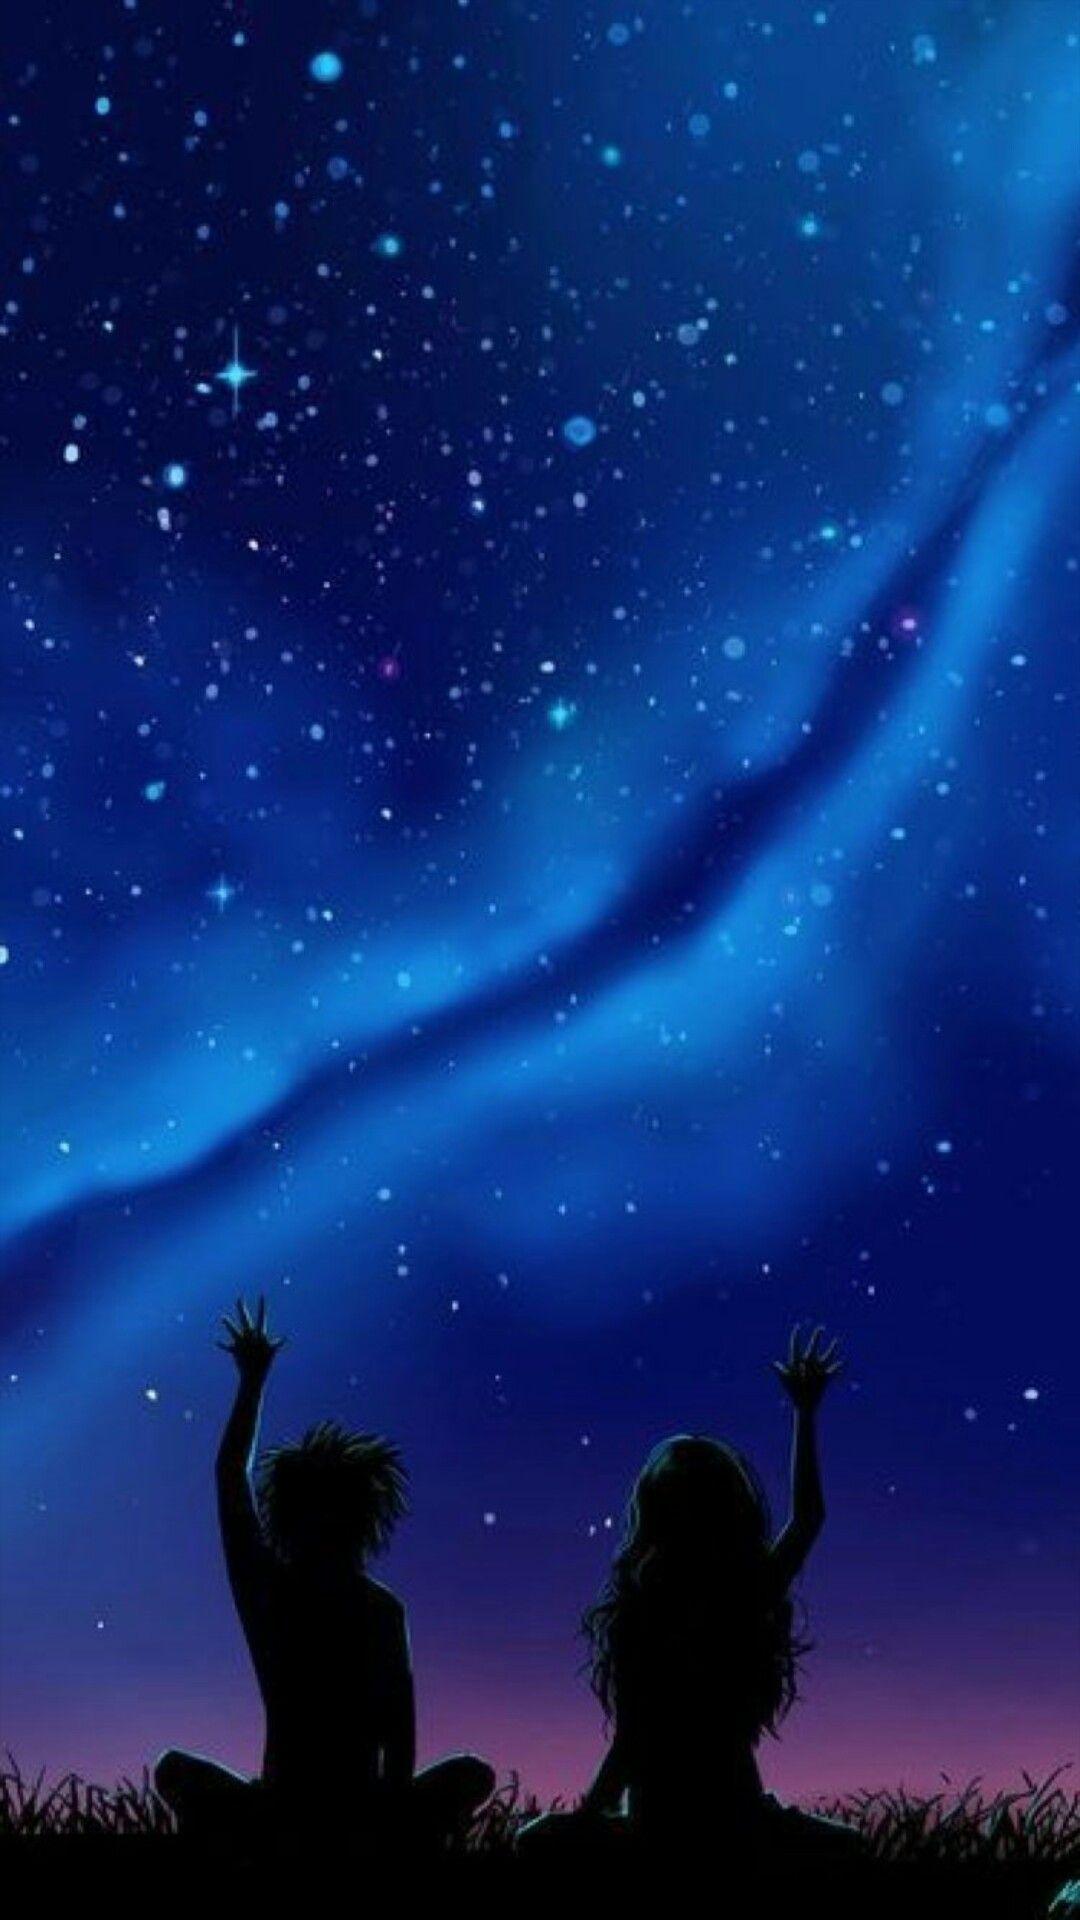 Pin By Mayato Saira On Wallpaper Anime Scenery Sky Anime Night Sky Painting Anime galaxy wallpaper couple